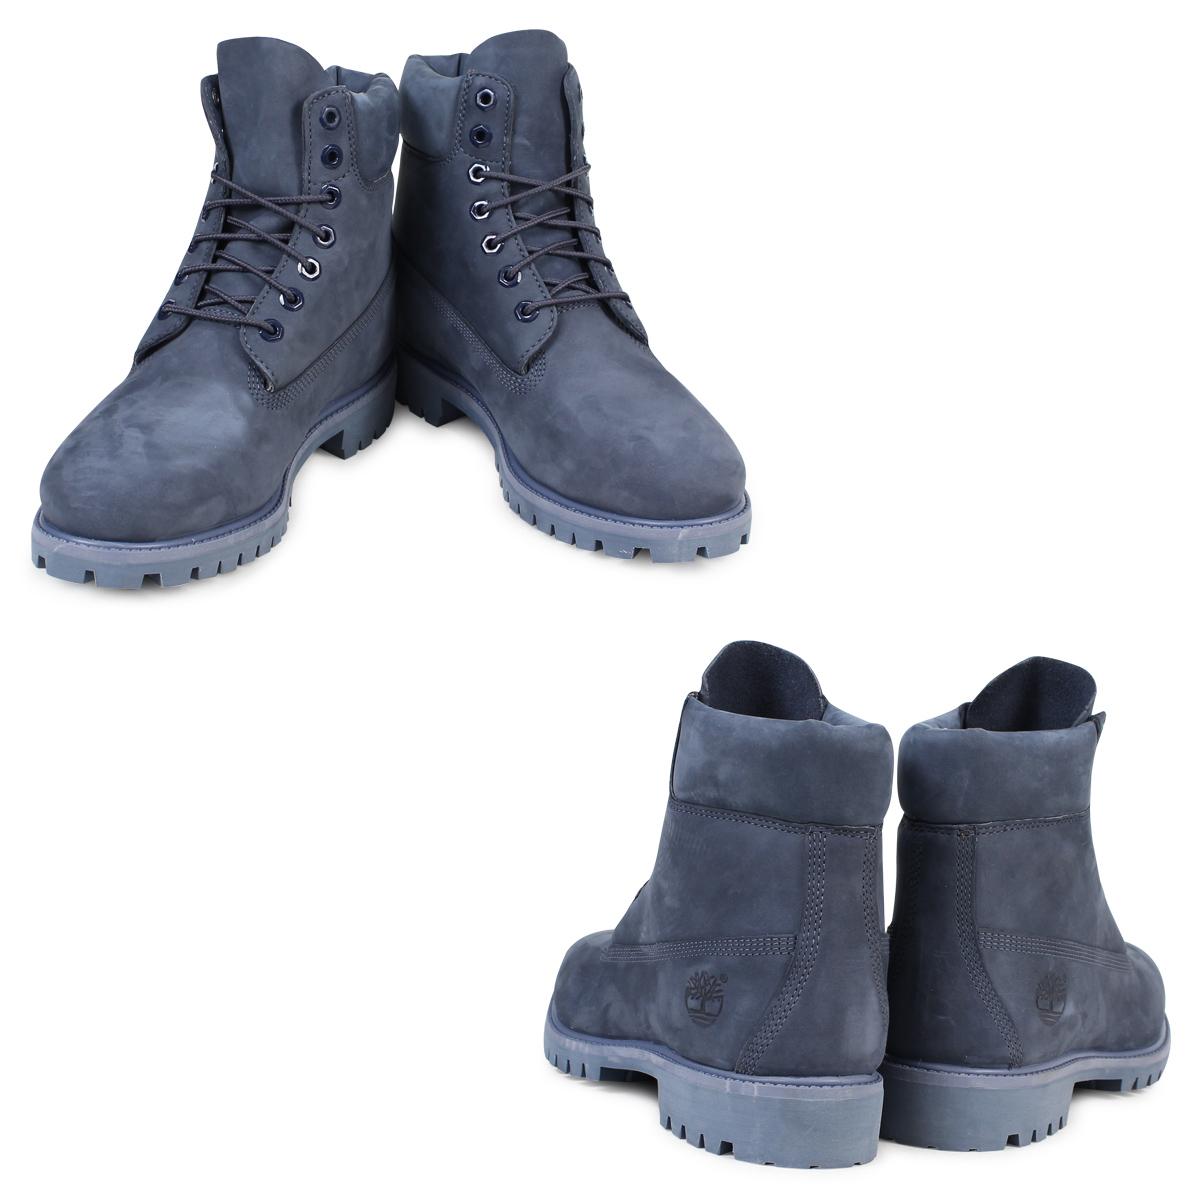 b757c1e5fc9 6 inches of Timberland 6INCH PREMIUM BOOT Timberland boots men A176X W Wise  premium waterproofing navies [12/8 Shinnyu load] [1712]